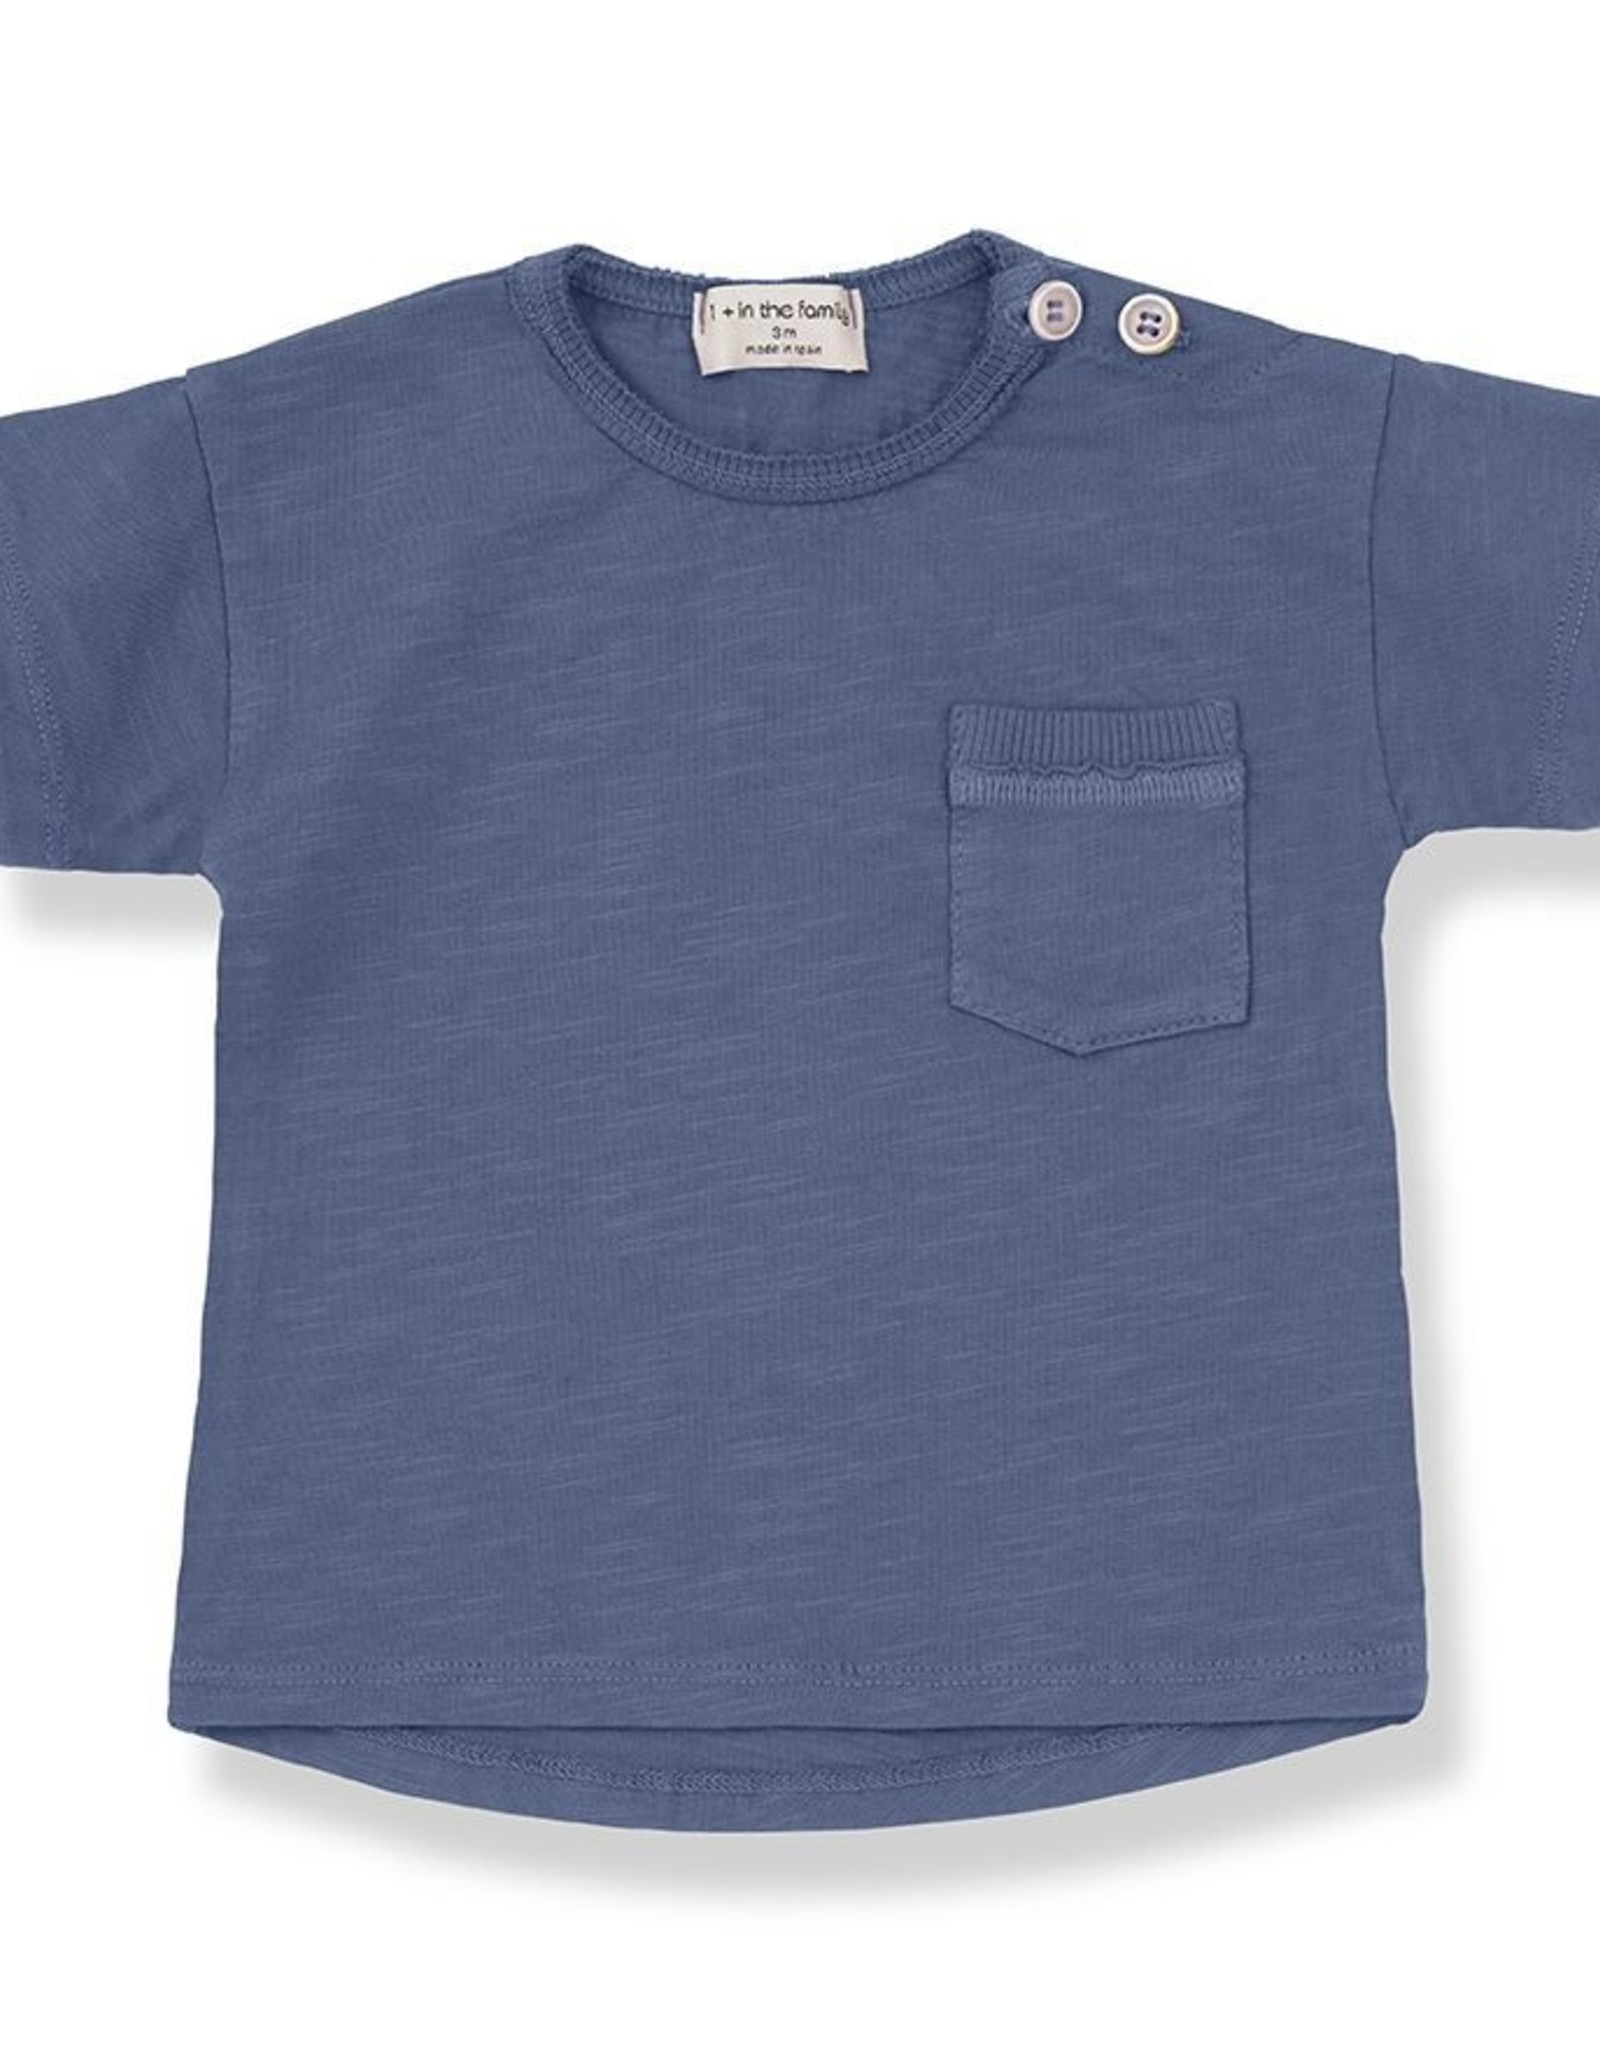 1+ in the Family vico shirt- azzurro